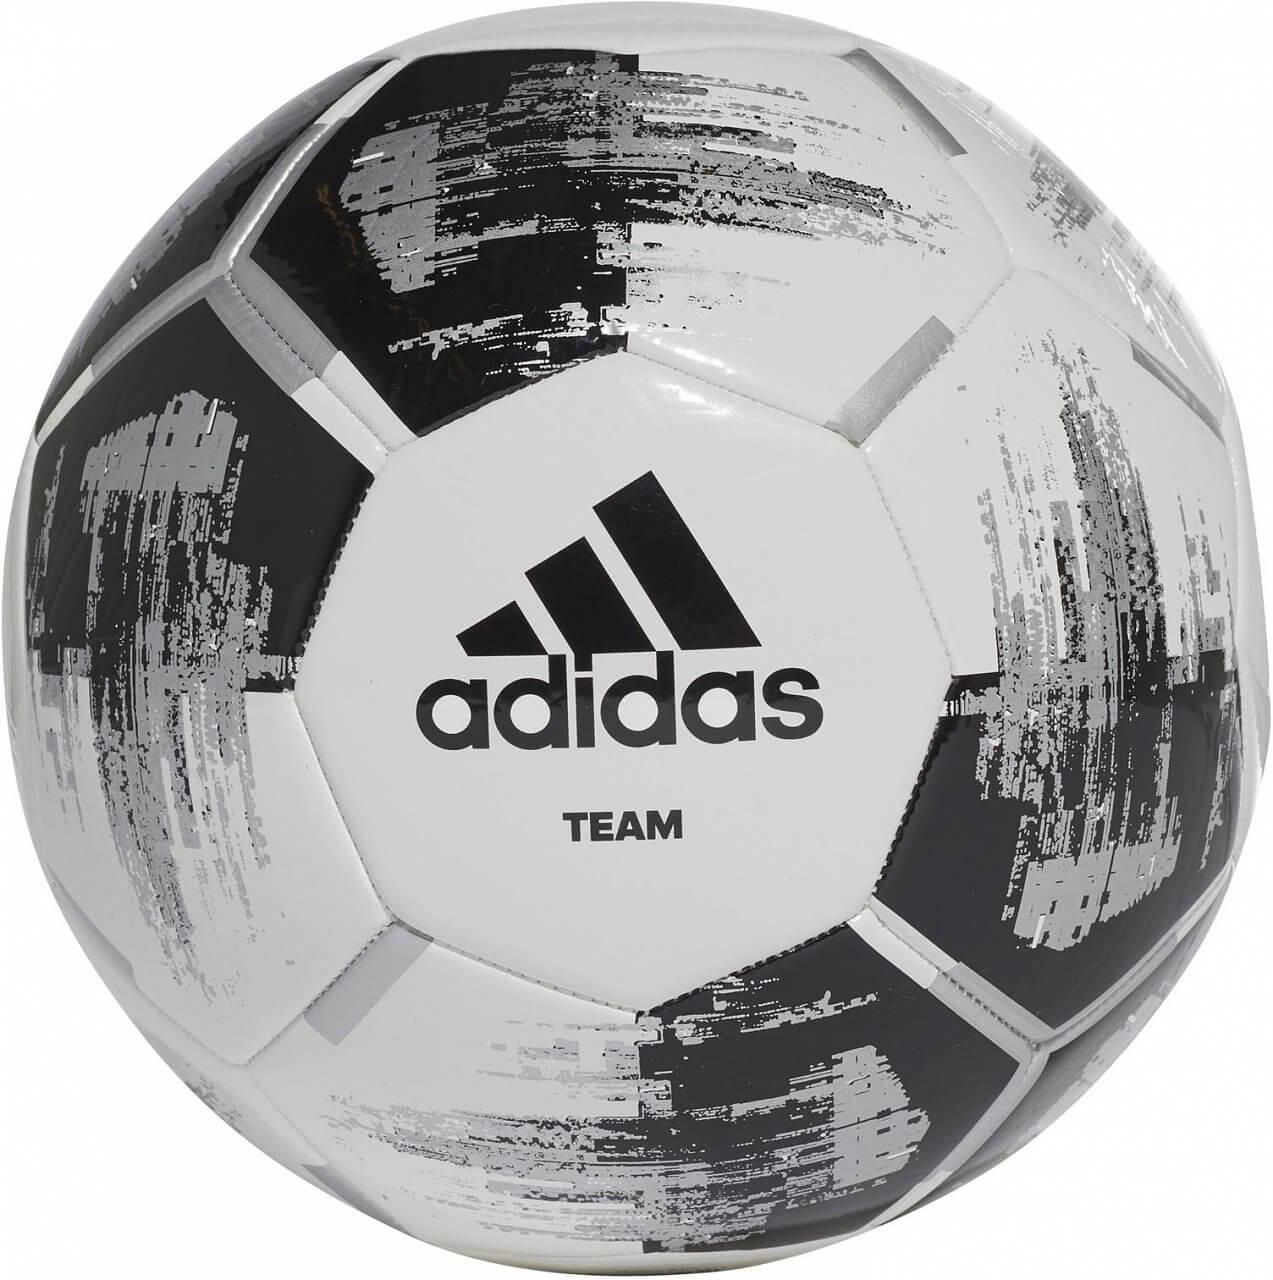 Fotbalový míč adidas TEAM Glider